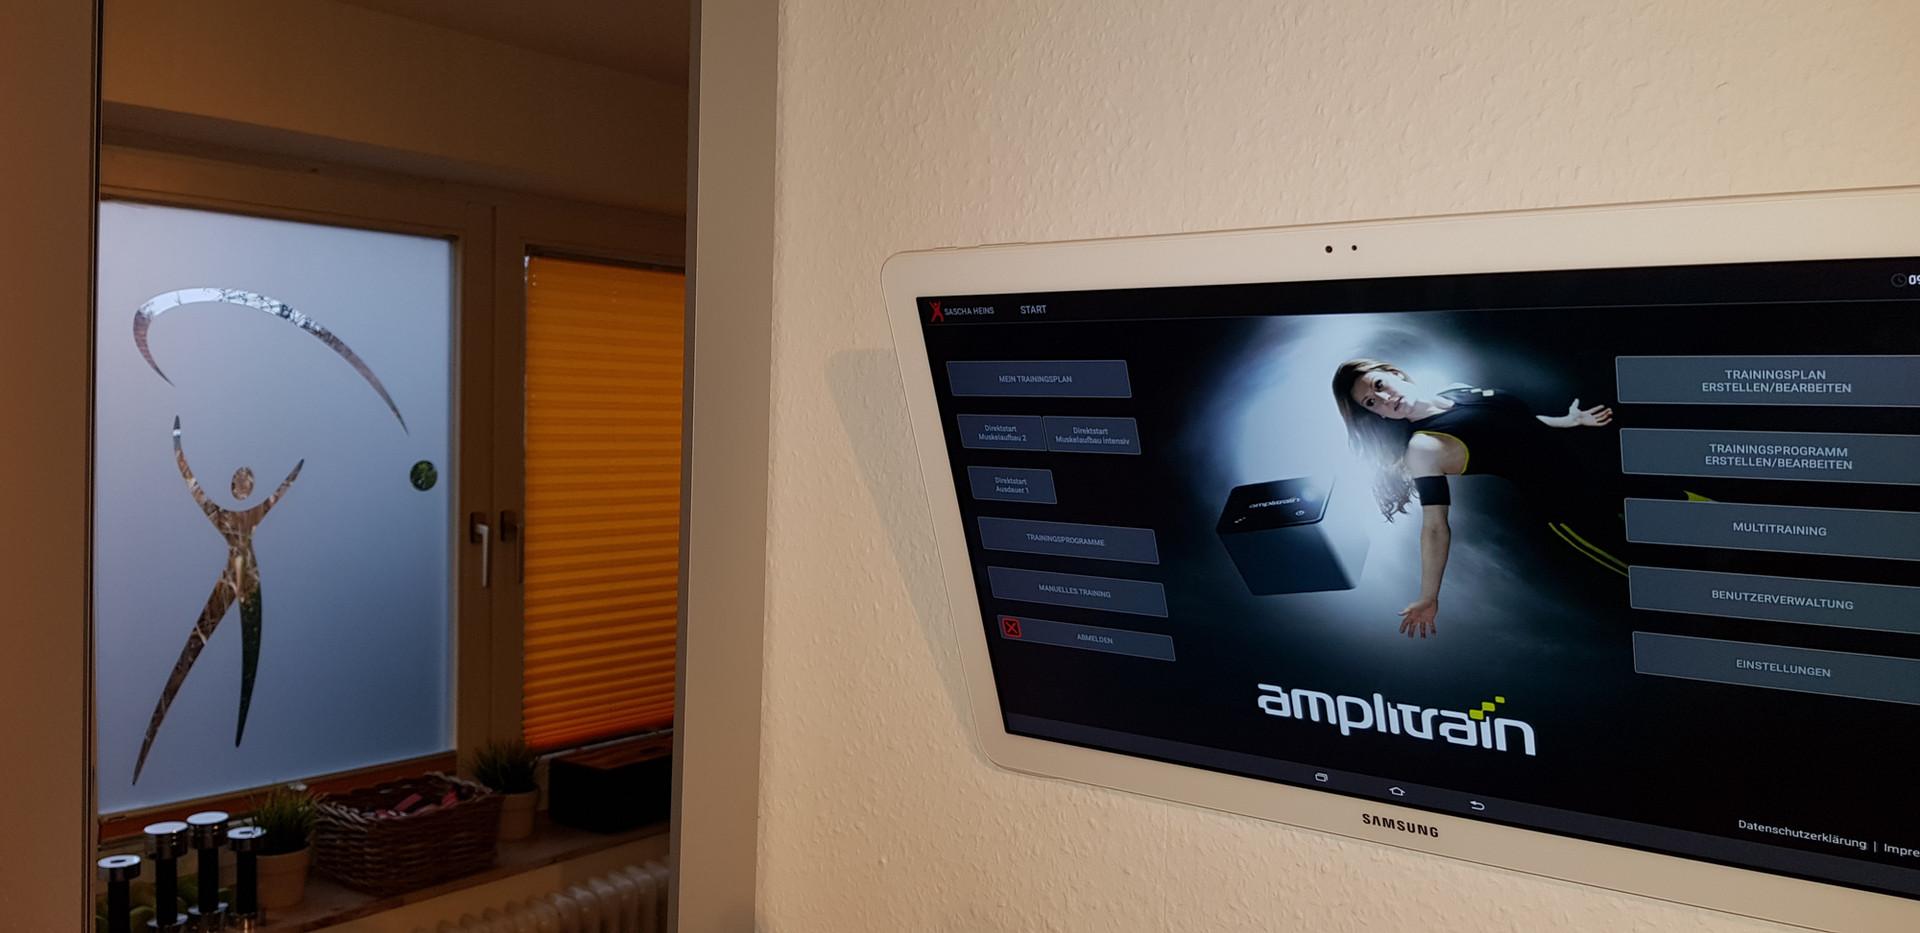 amplitrain-2.jpg